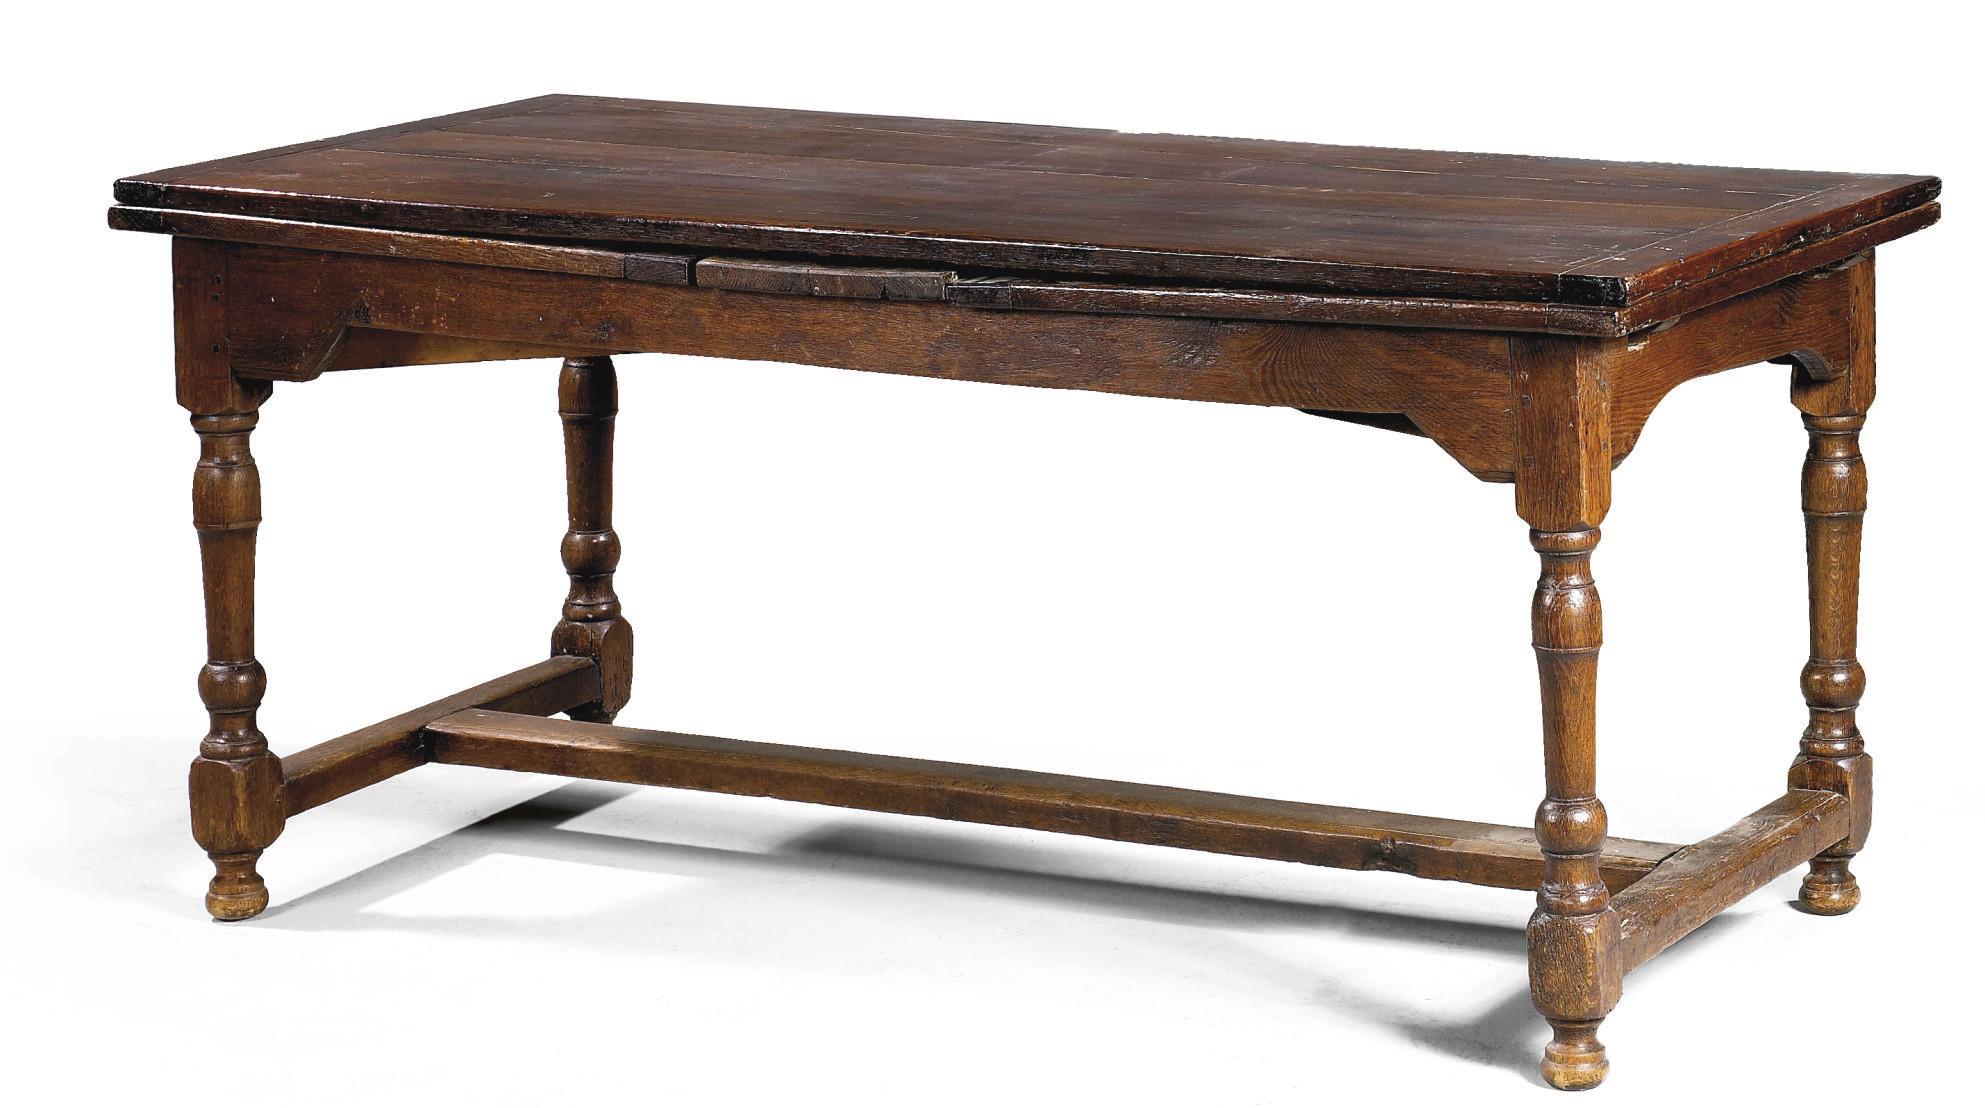 TABLE DU XVIIIEME SIECLE